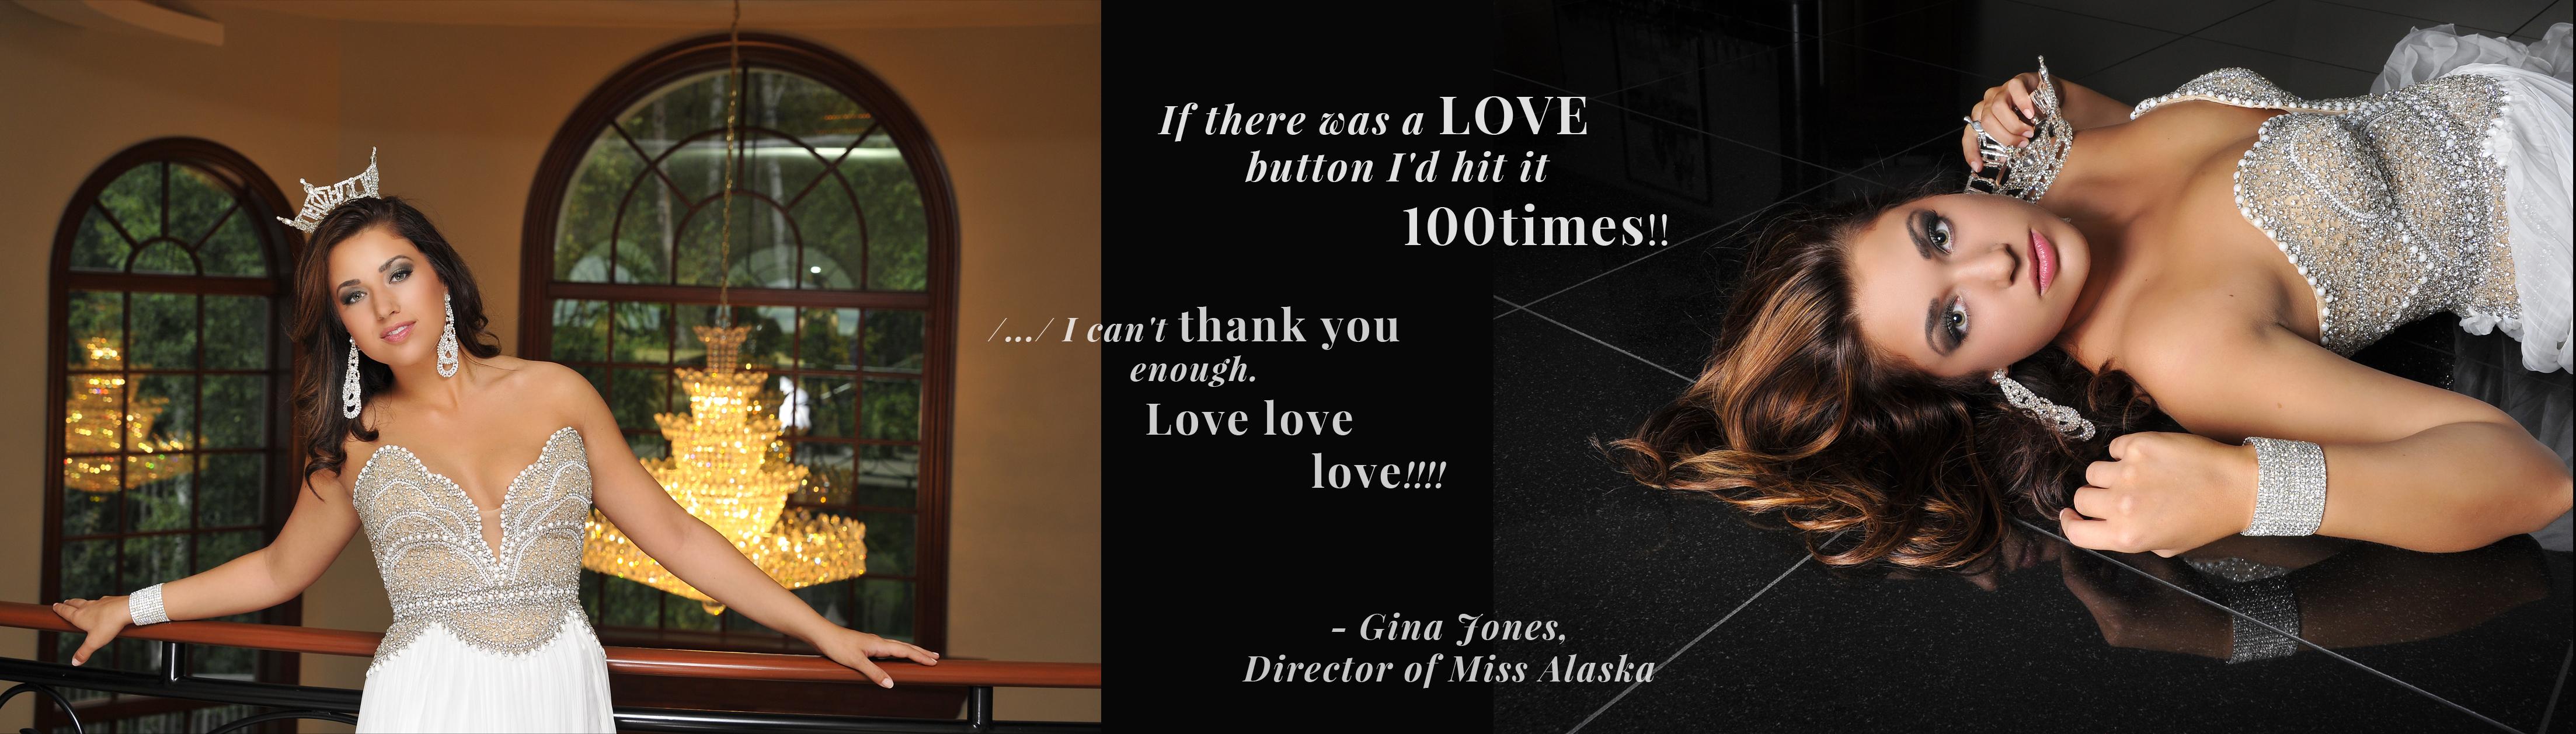 Miss_Alaska_Miss_America_Malie_Delgado_KGOT_radio_personality_Anchorage_Alaska_photographer_Eagle_Ri